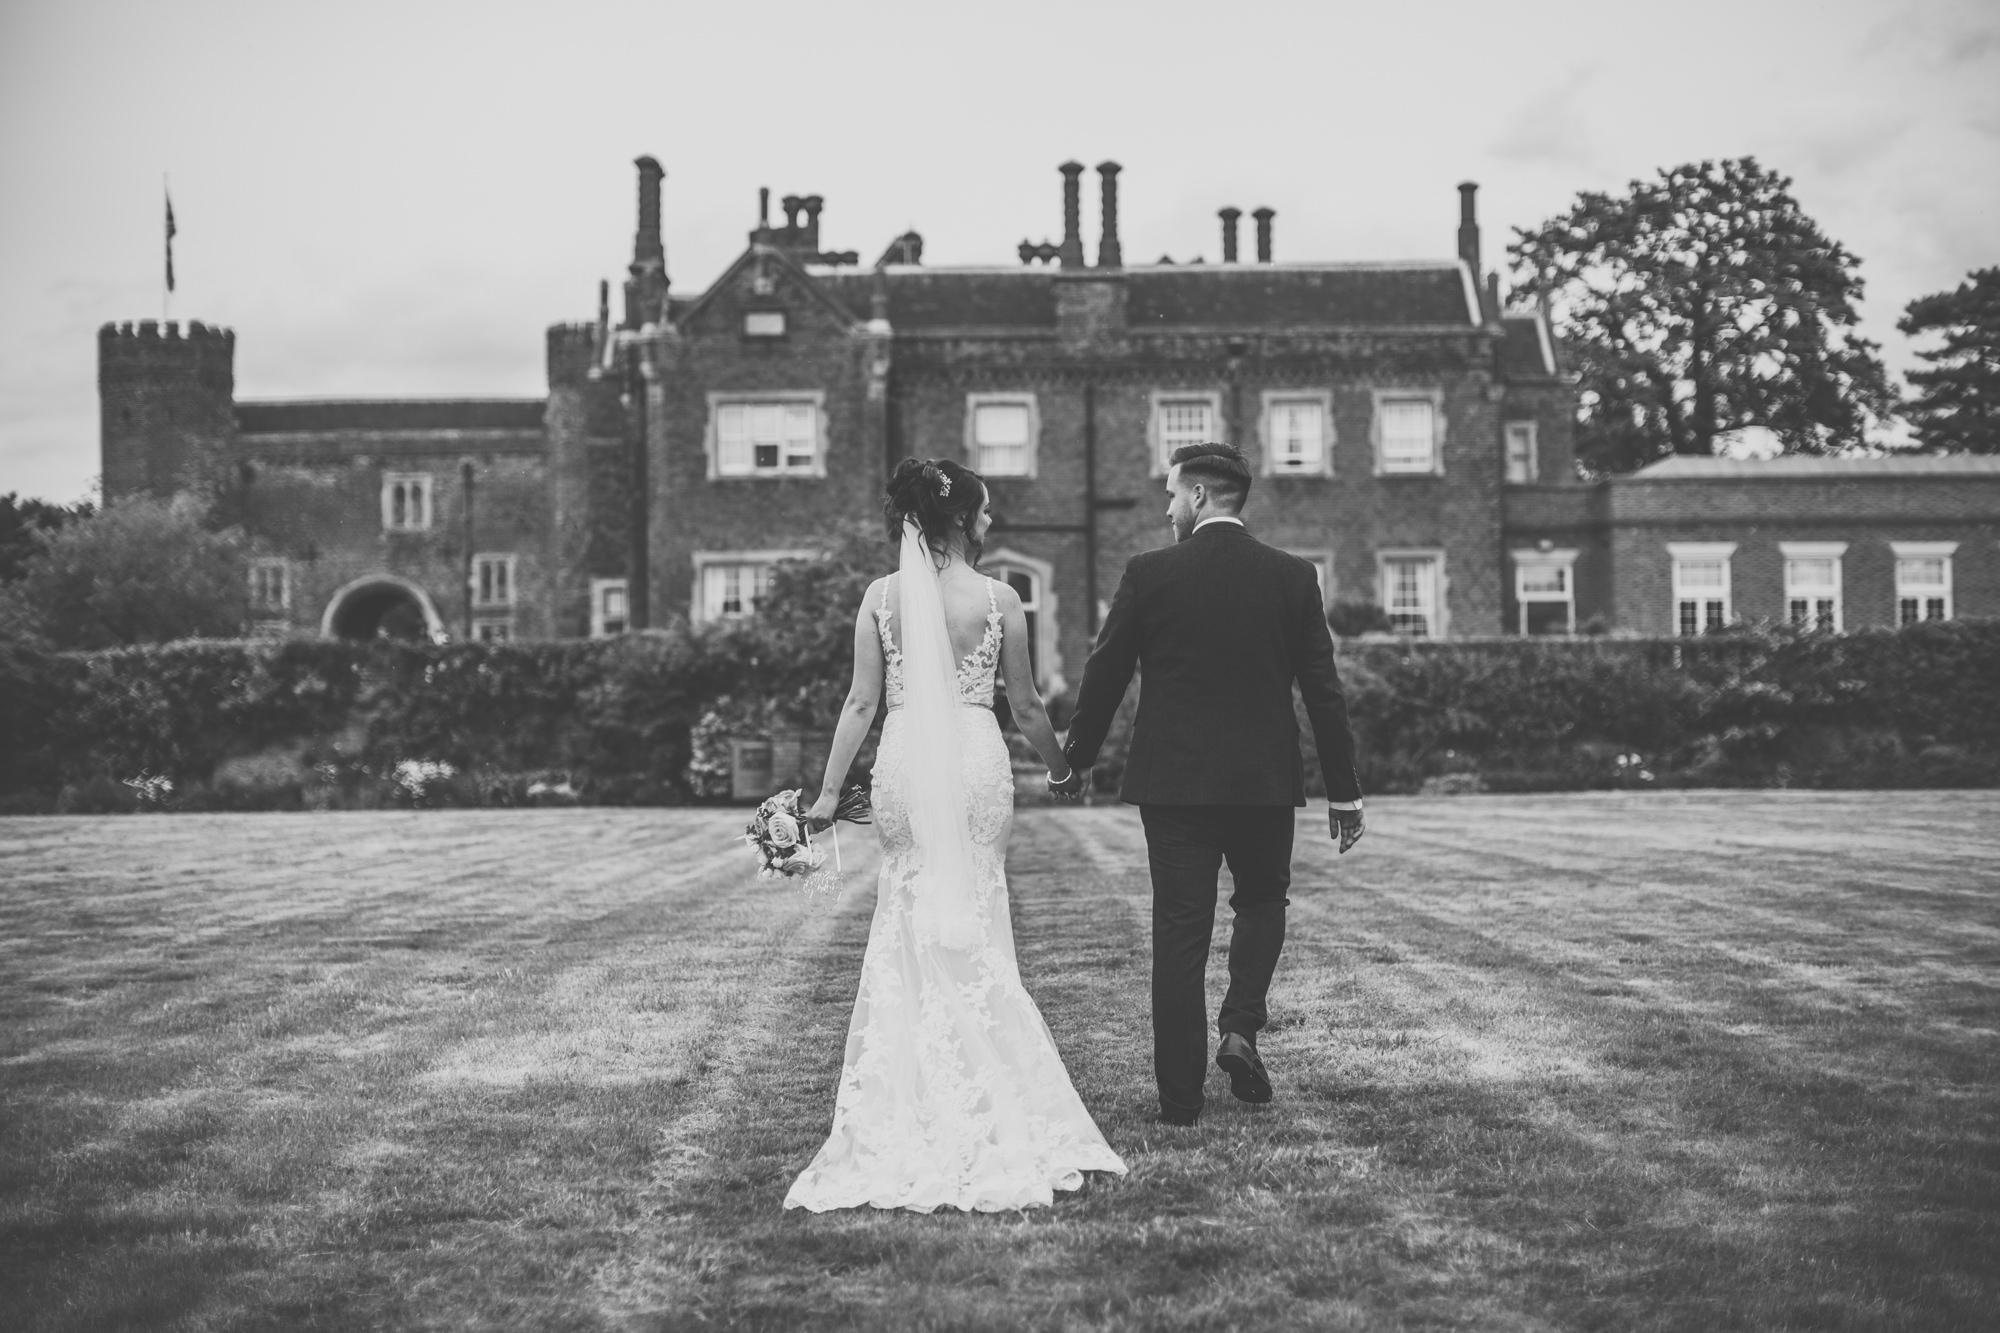 hodsock priory wedding photographers blog60.jpg